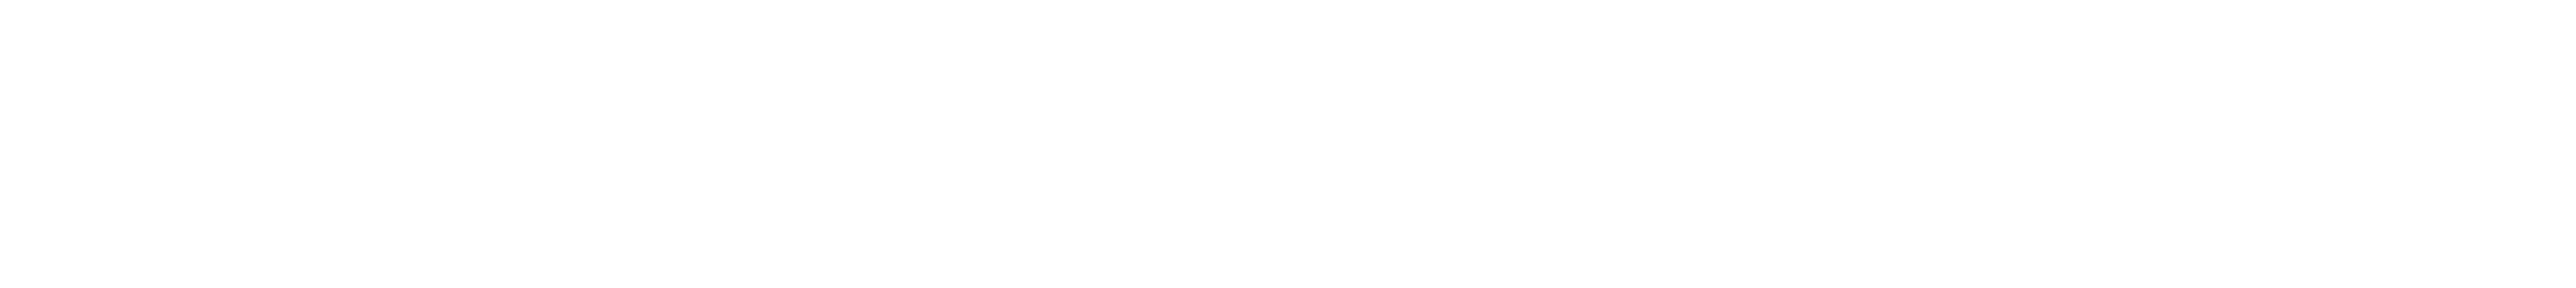 World Environment Day 2020 Jun 05 2020